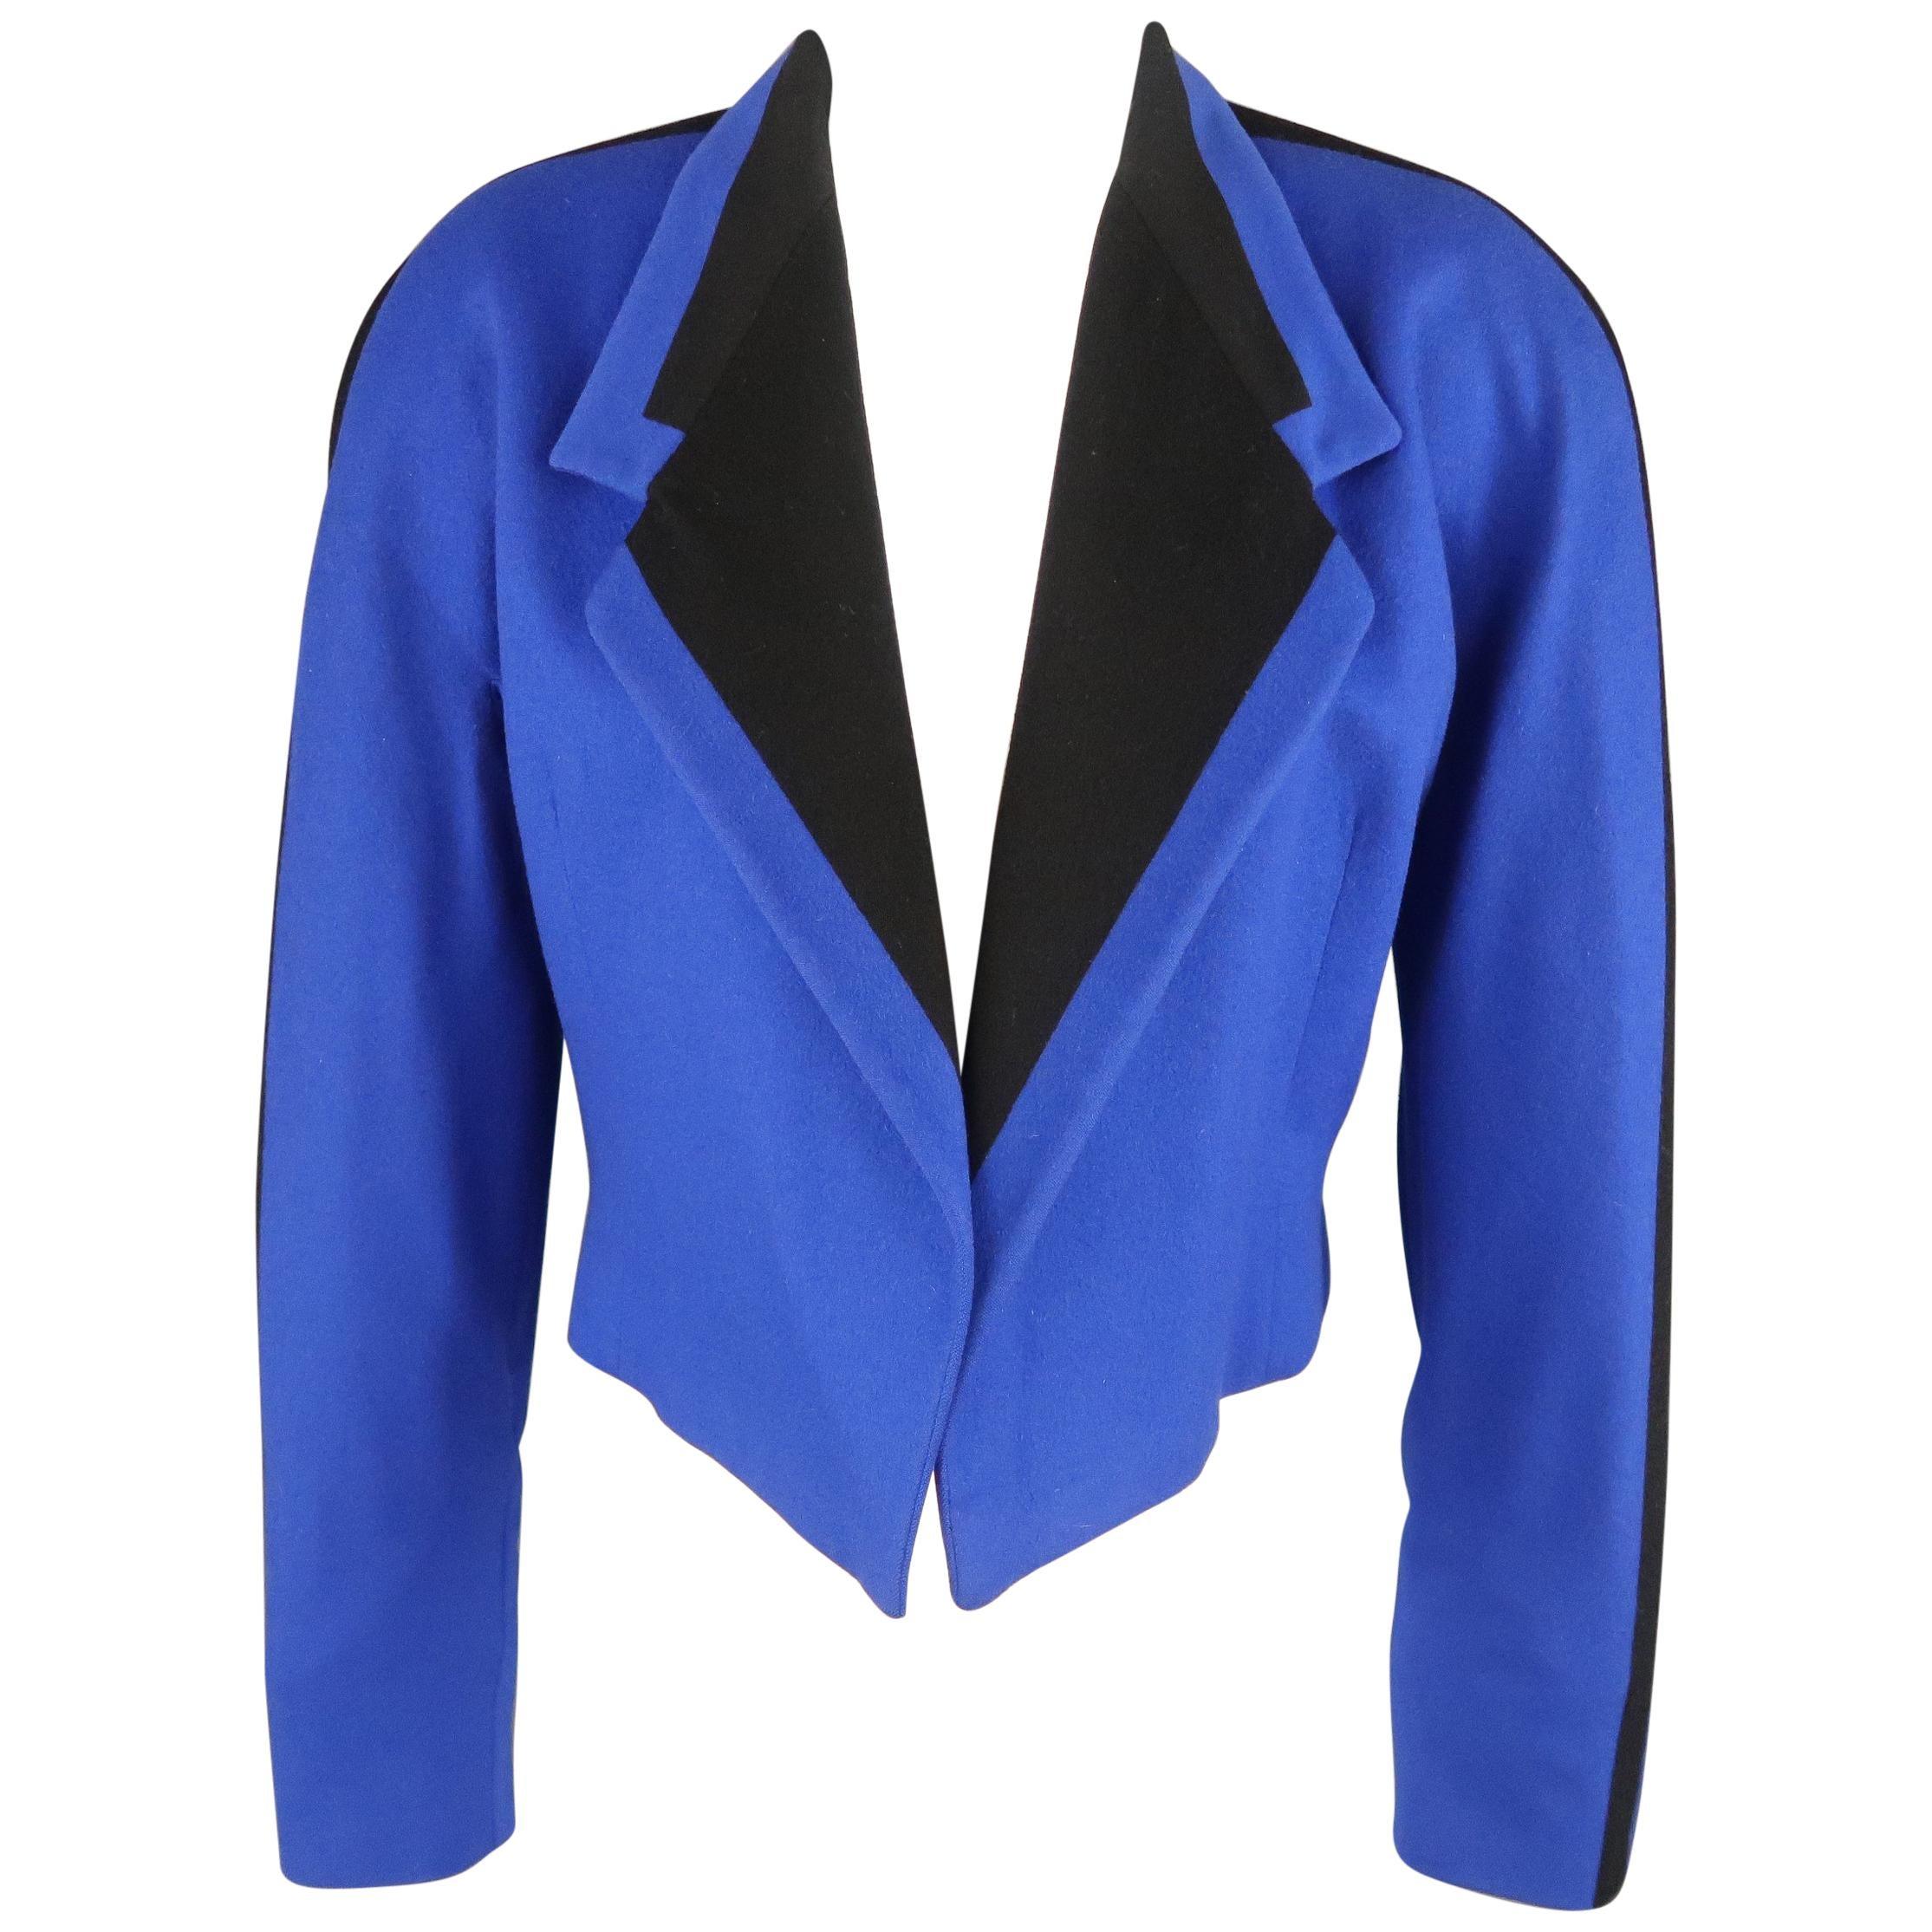 GIANNI VERSACE Size 8 Blue & Black Wool Cropped Blazer Jacket